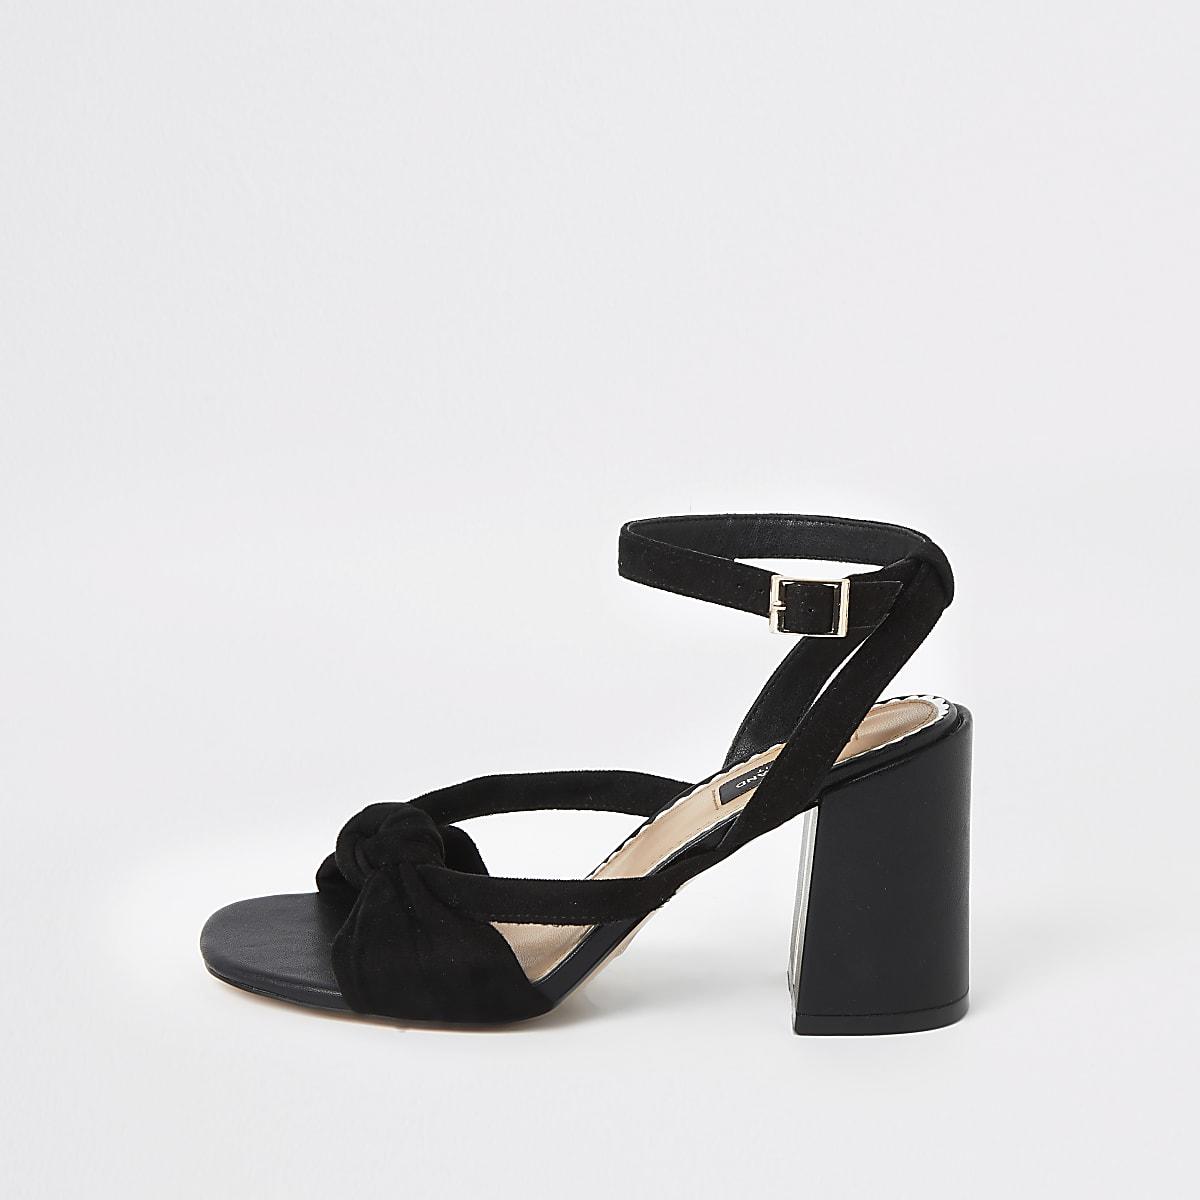 Black wide fit knot front flare heel sandals